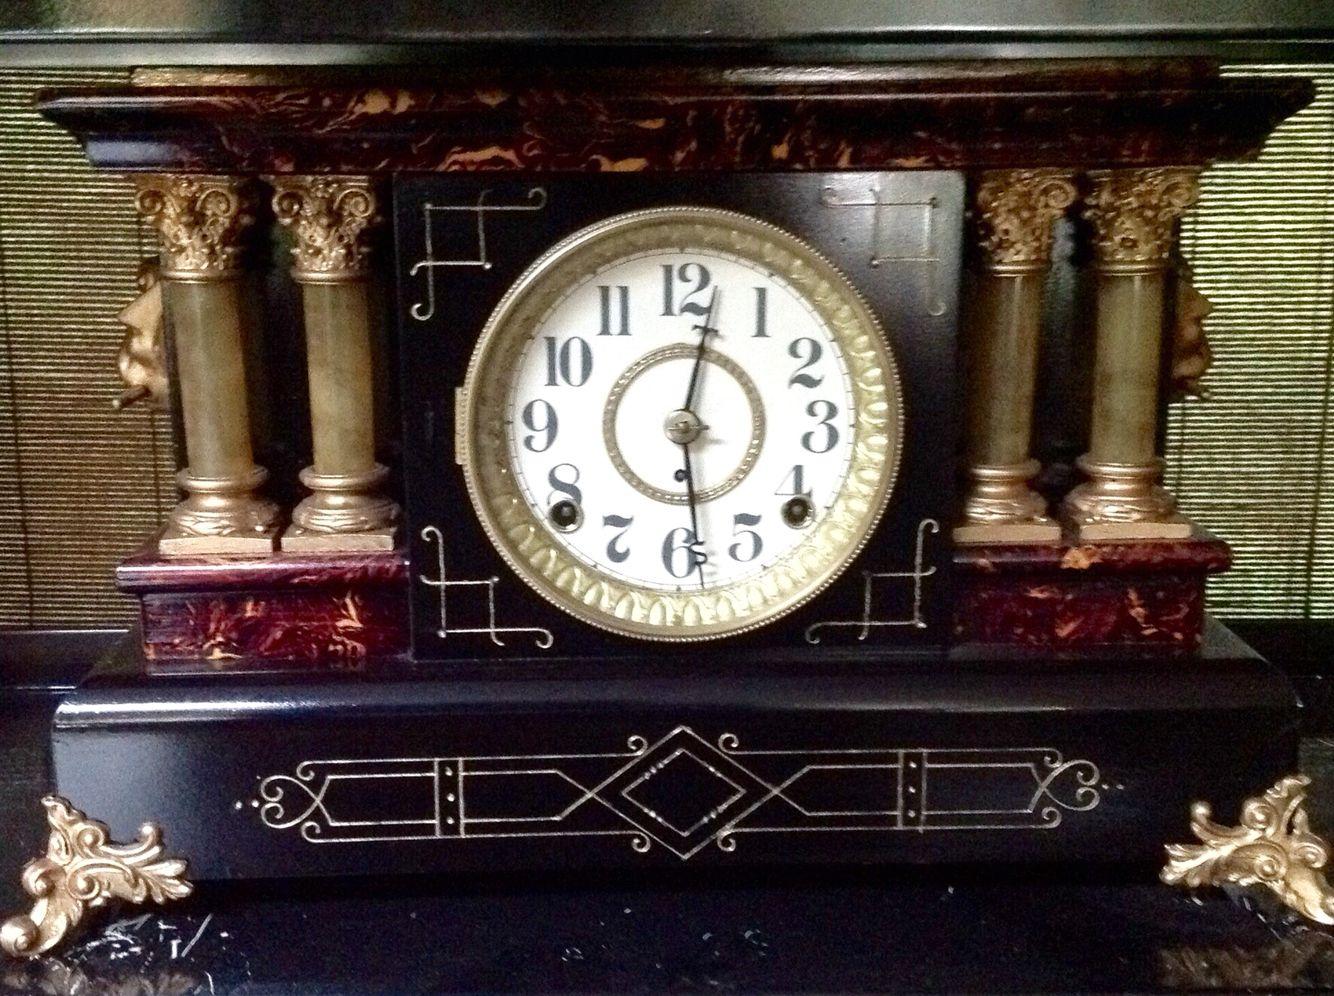 Dating celluloid clocks